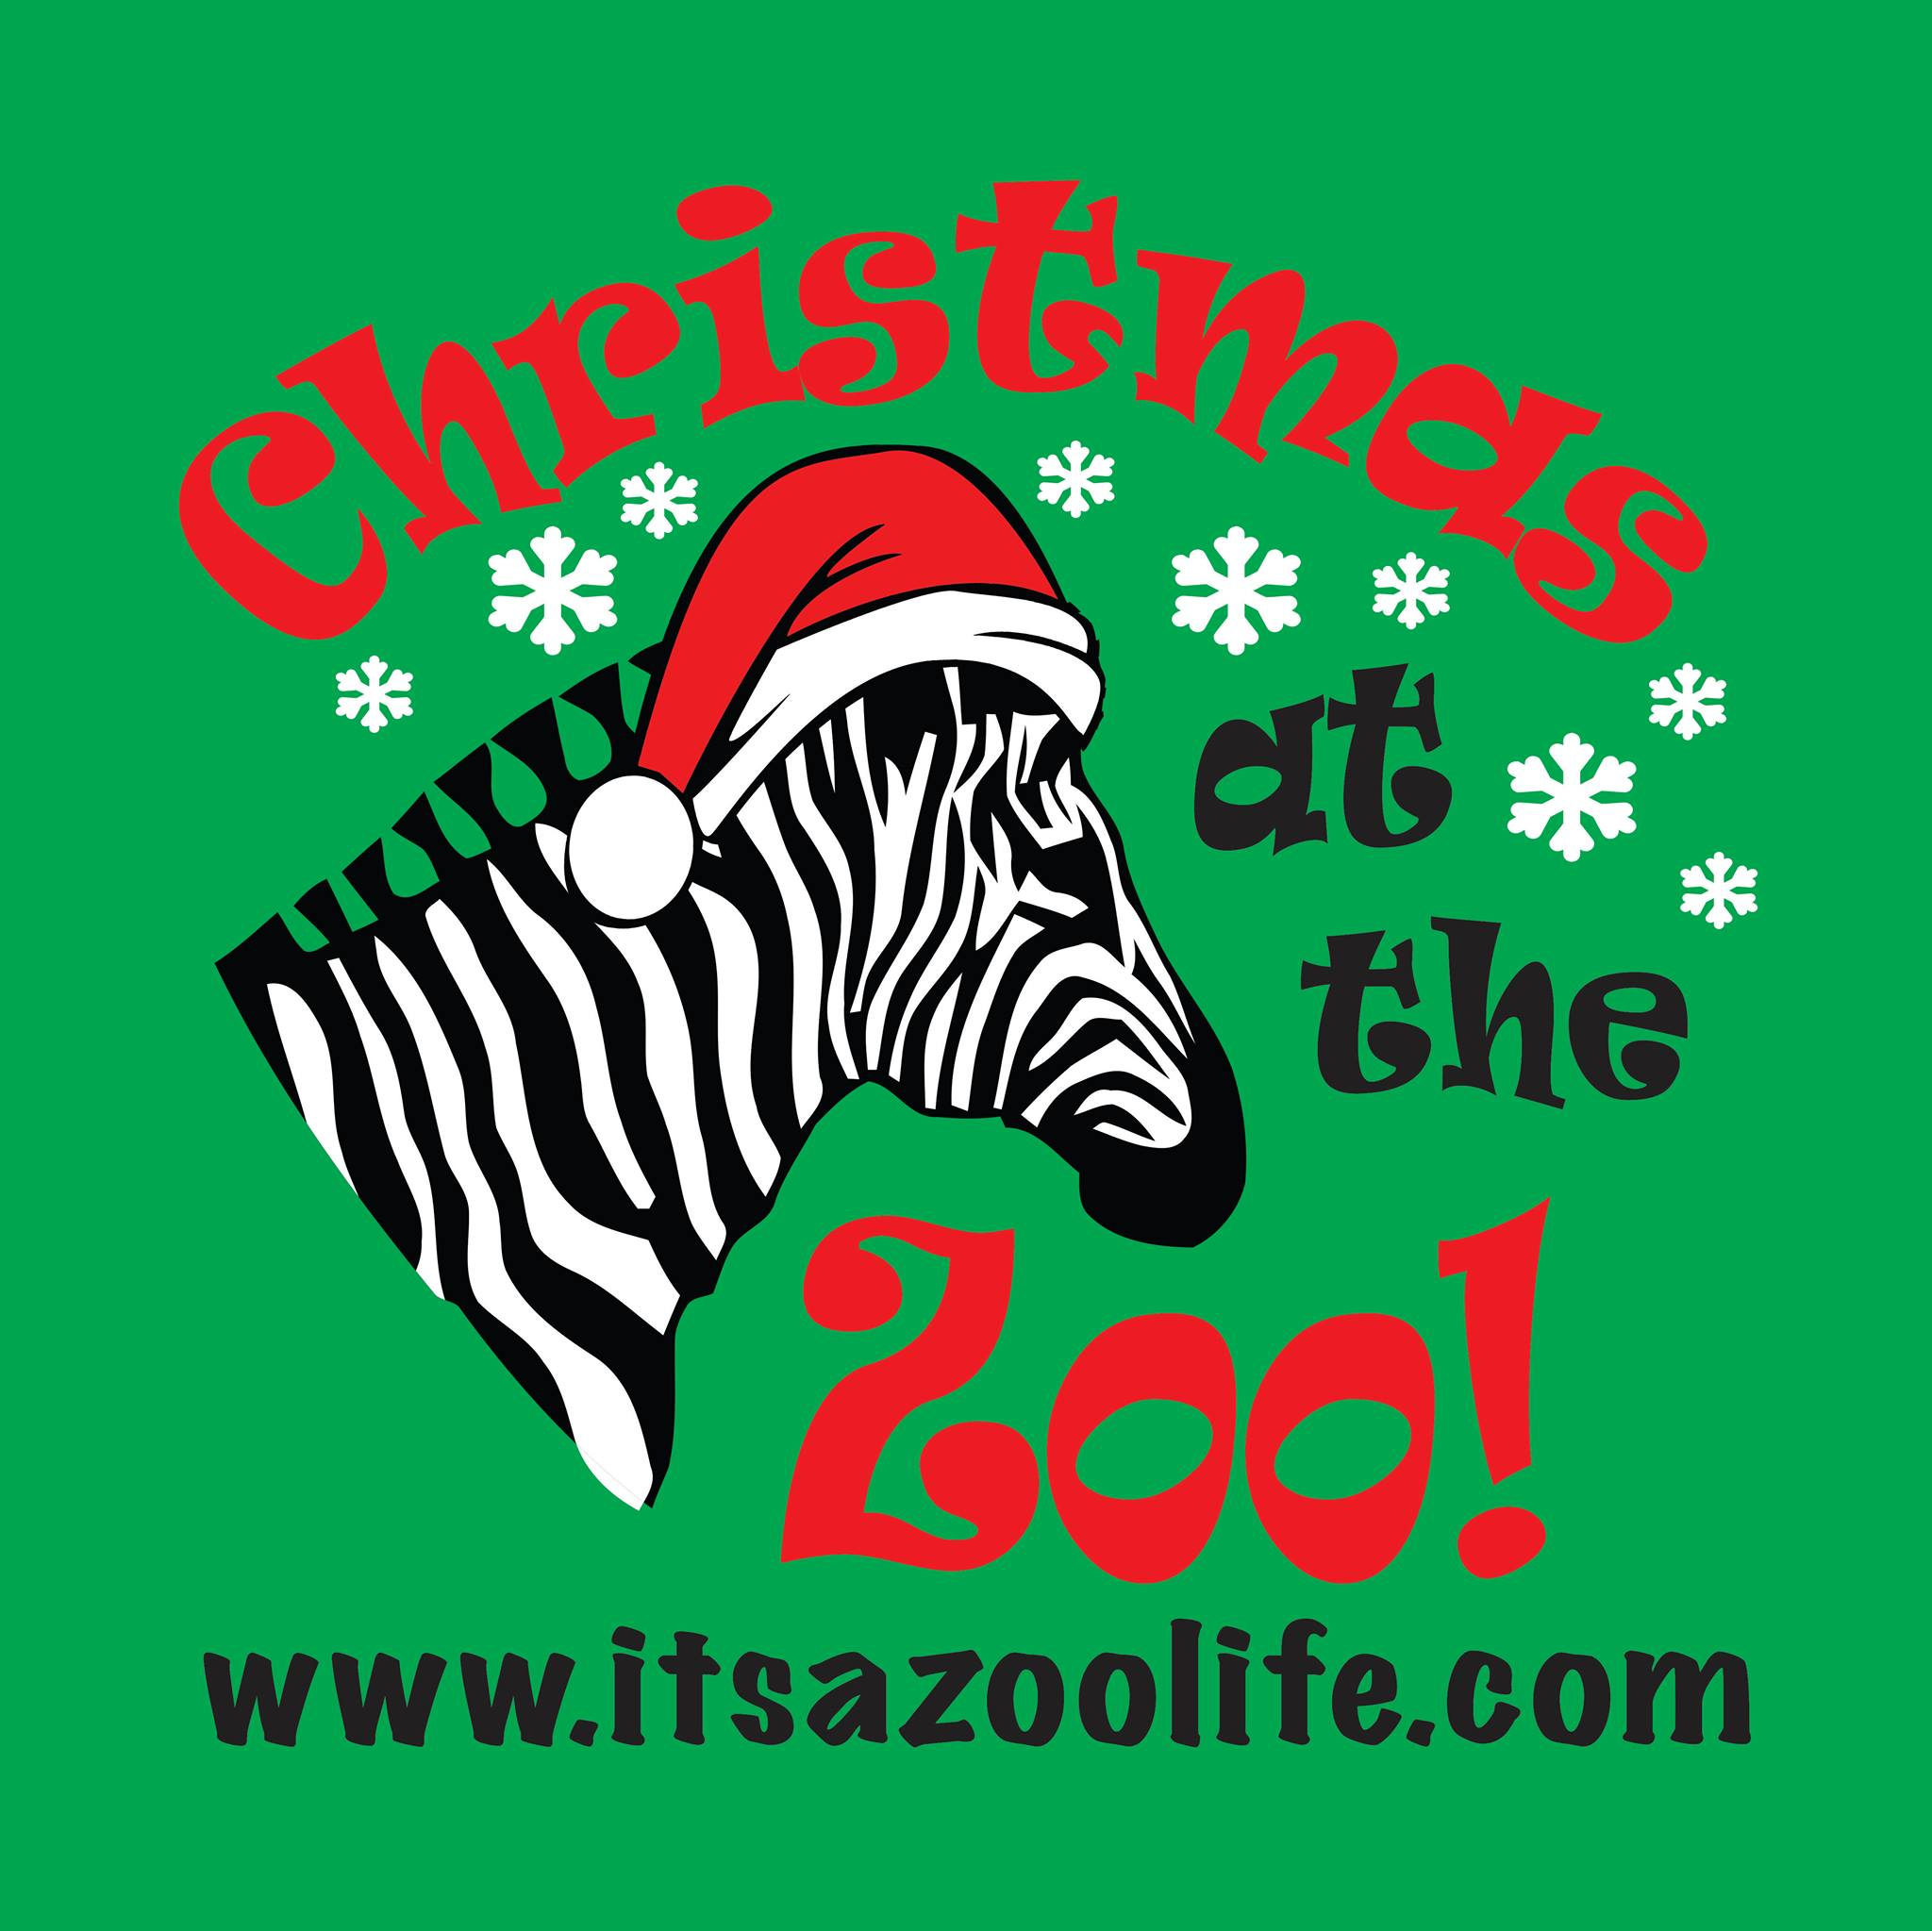 Christmas At The Zoo.Christmas At The Zoo November 30